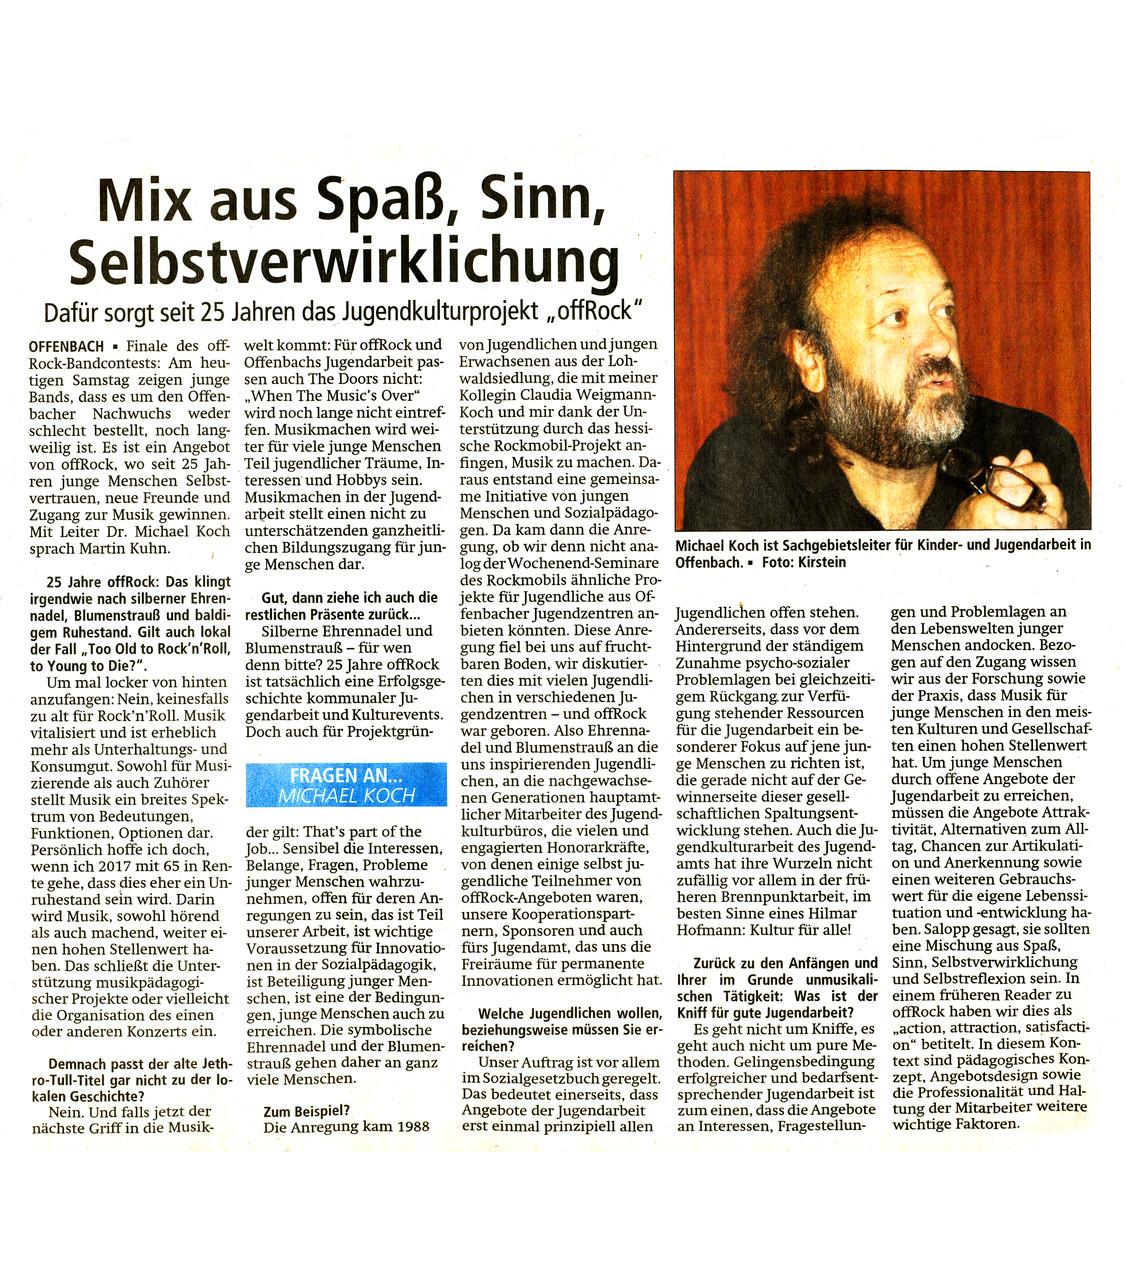 Offenbach Post, 7. Februar 2015